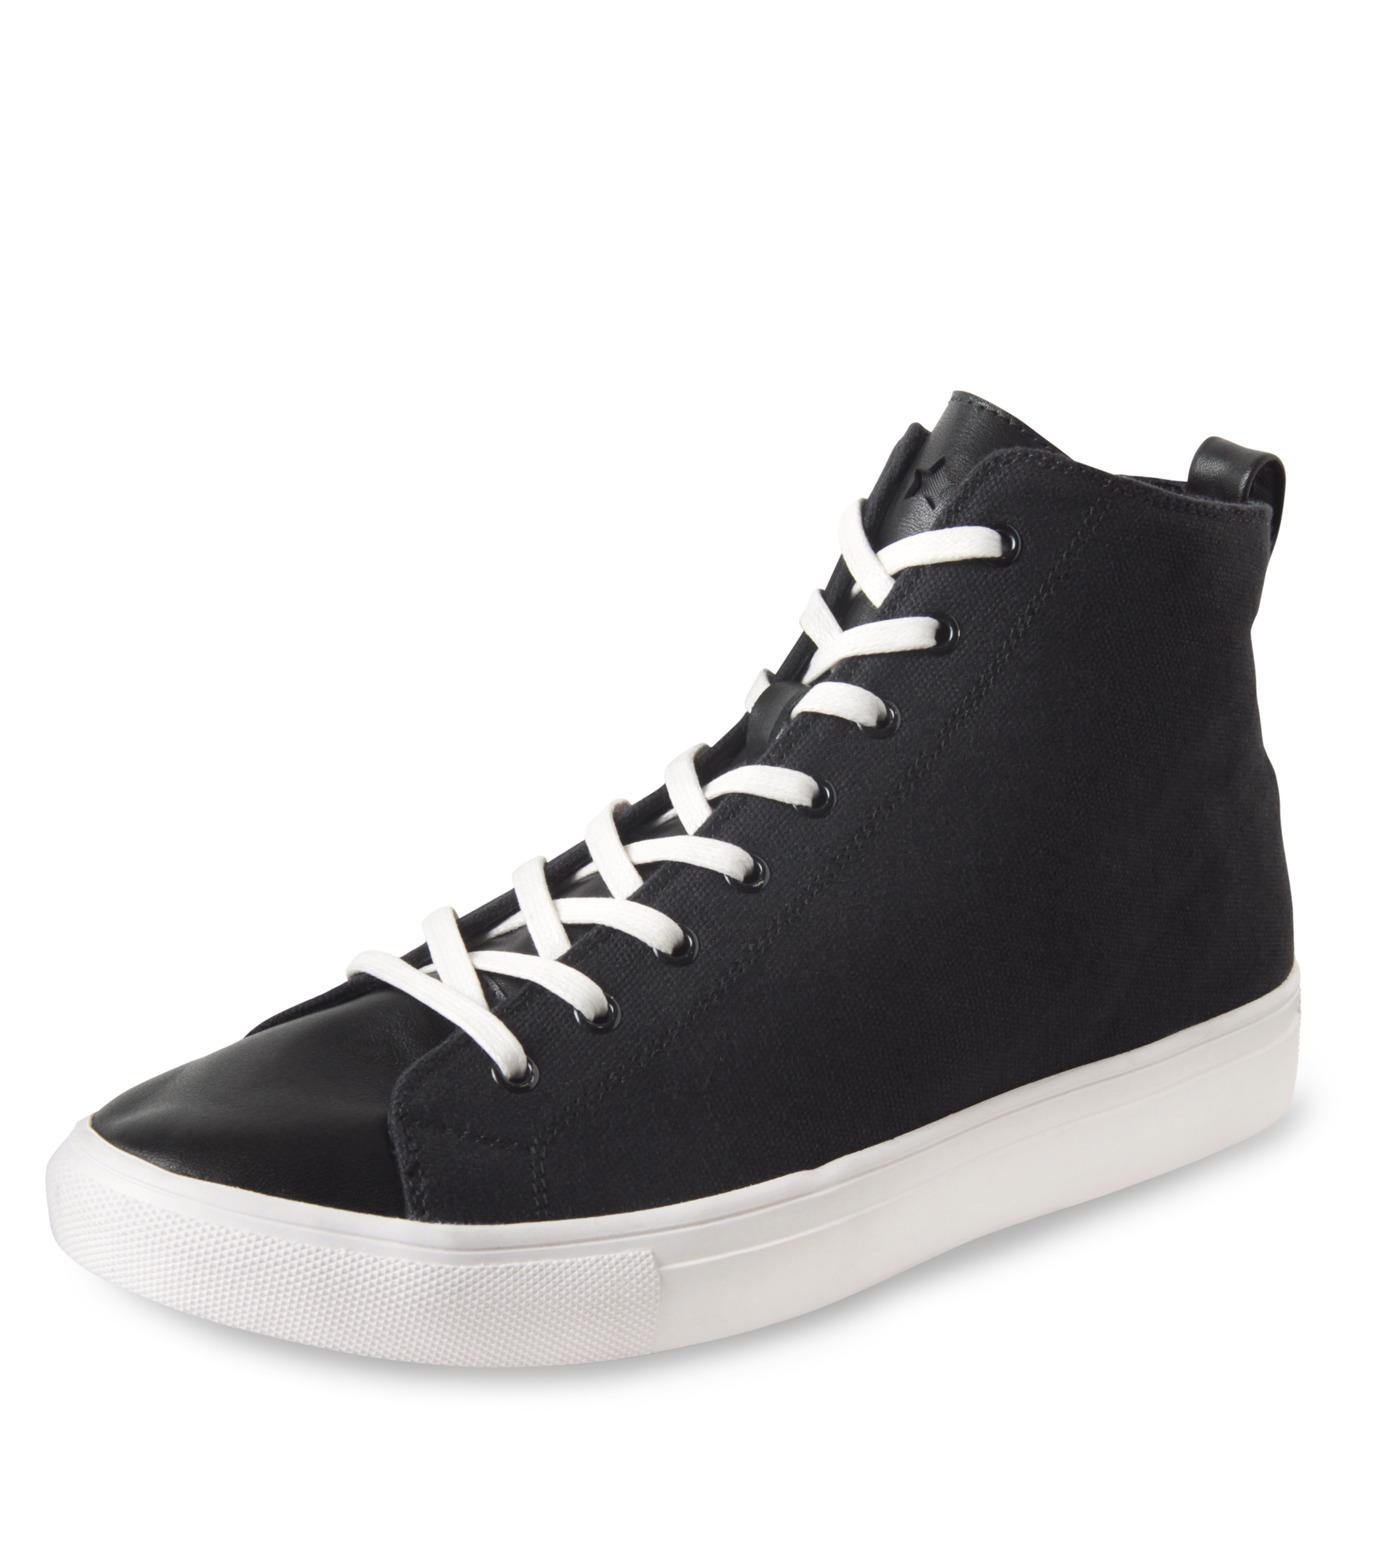 HL HEDDIE LOVU(エイチエル・エディールーヴ)のHL Hi sneaker-BLACK(スニーカー/sneaker)-16A90006-13 拡大詳細画像6